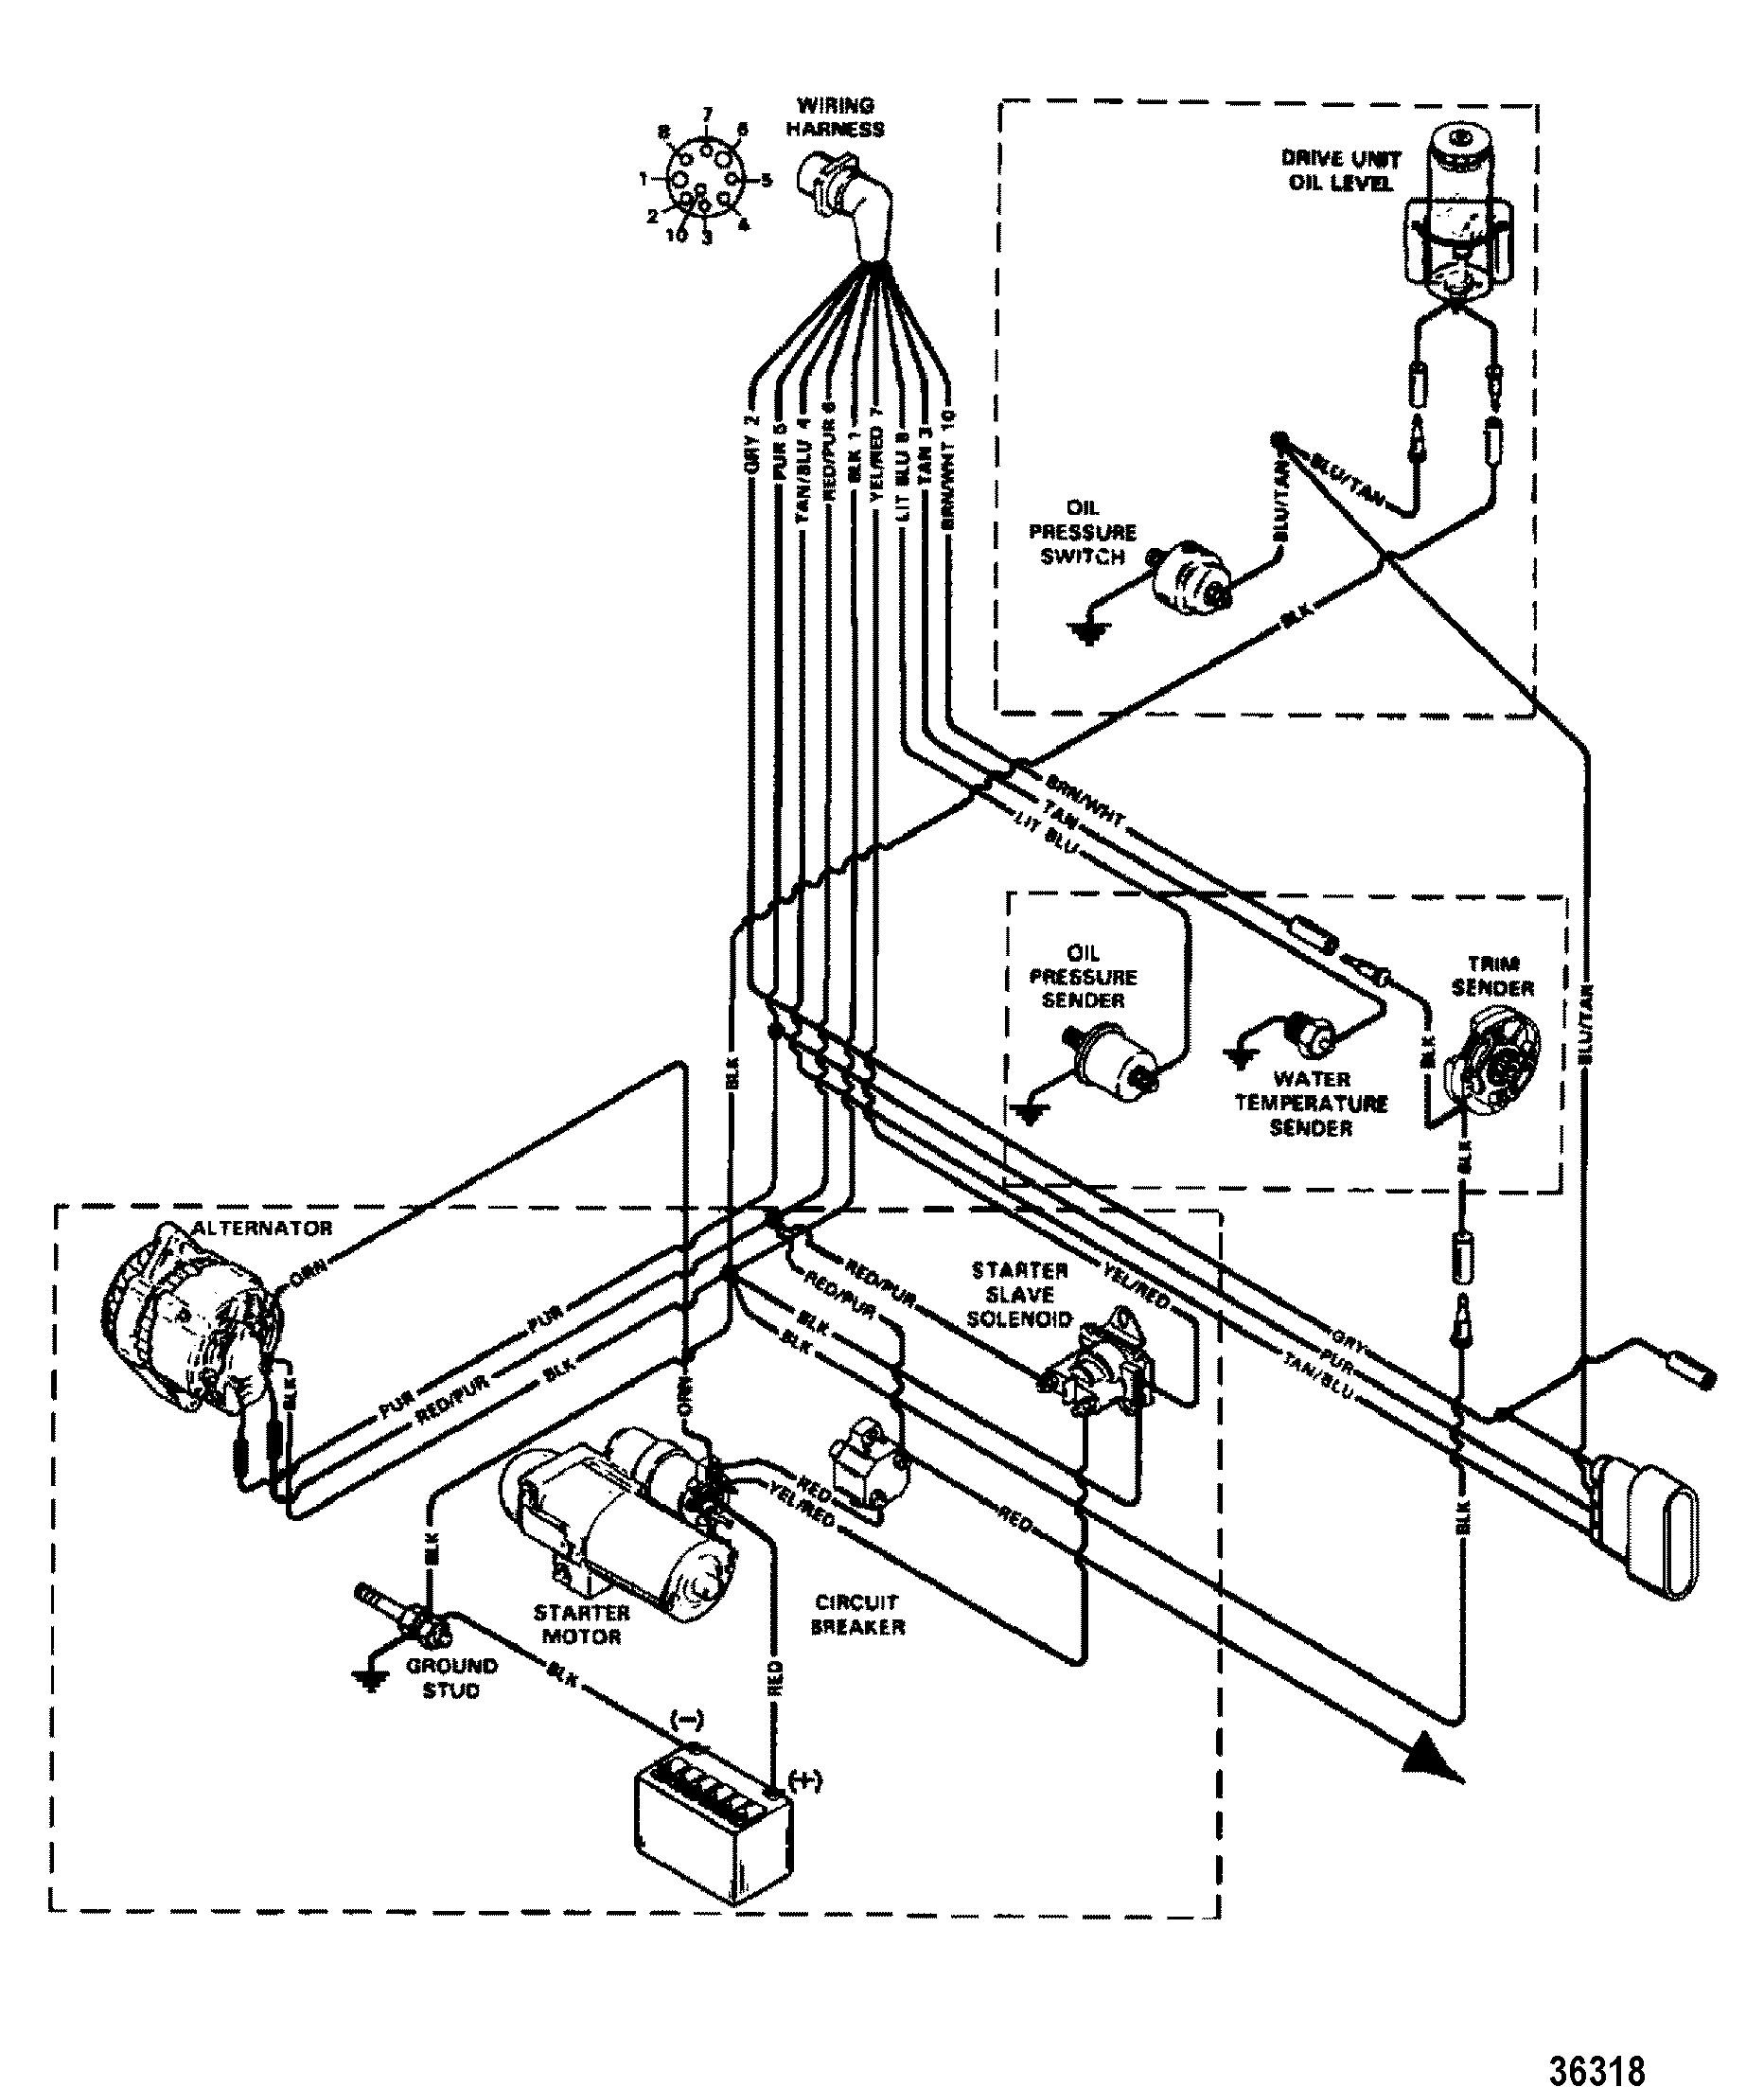 mercruiser 7 4 alternator wiring diagram wiring library Reznor Heater Parts Diagram wiring diagram for mercruiser 140 yhgfdmuor net showy ignition